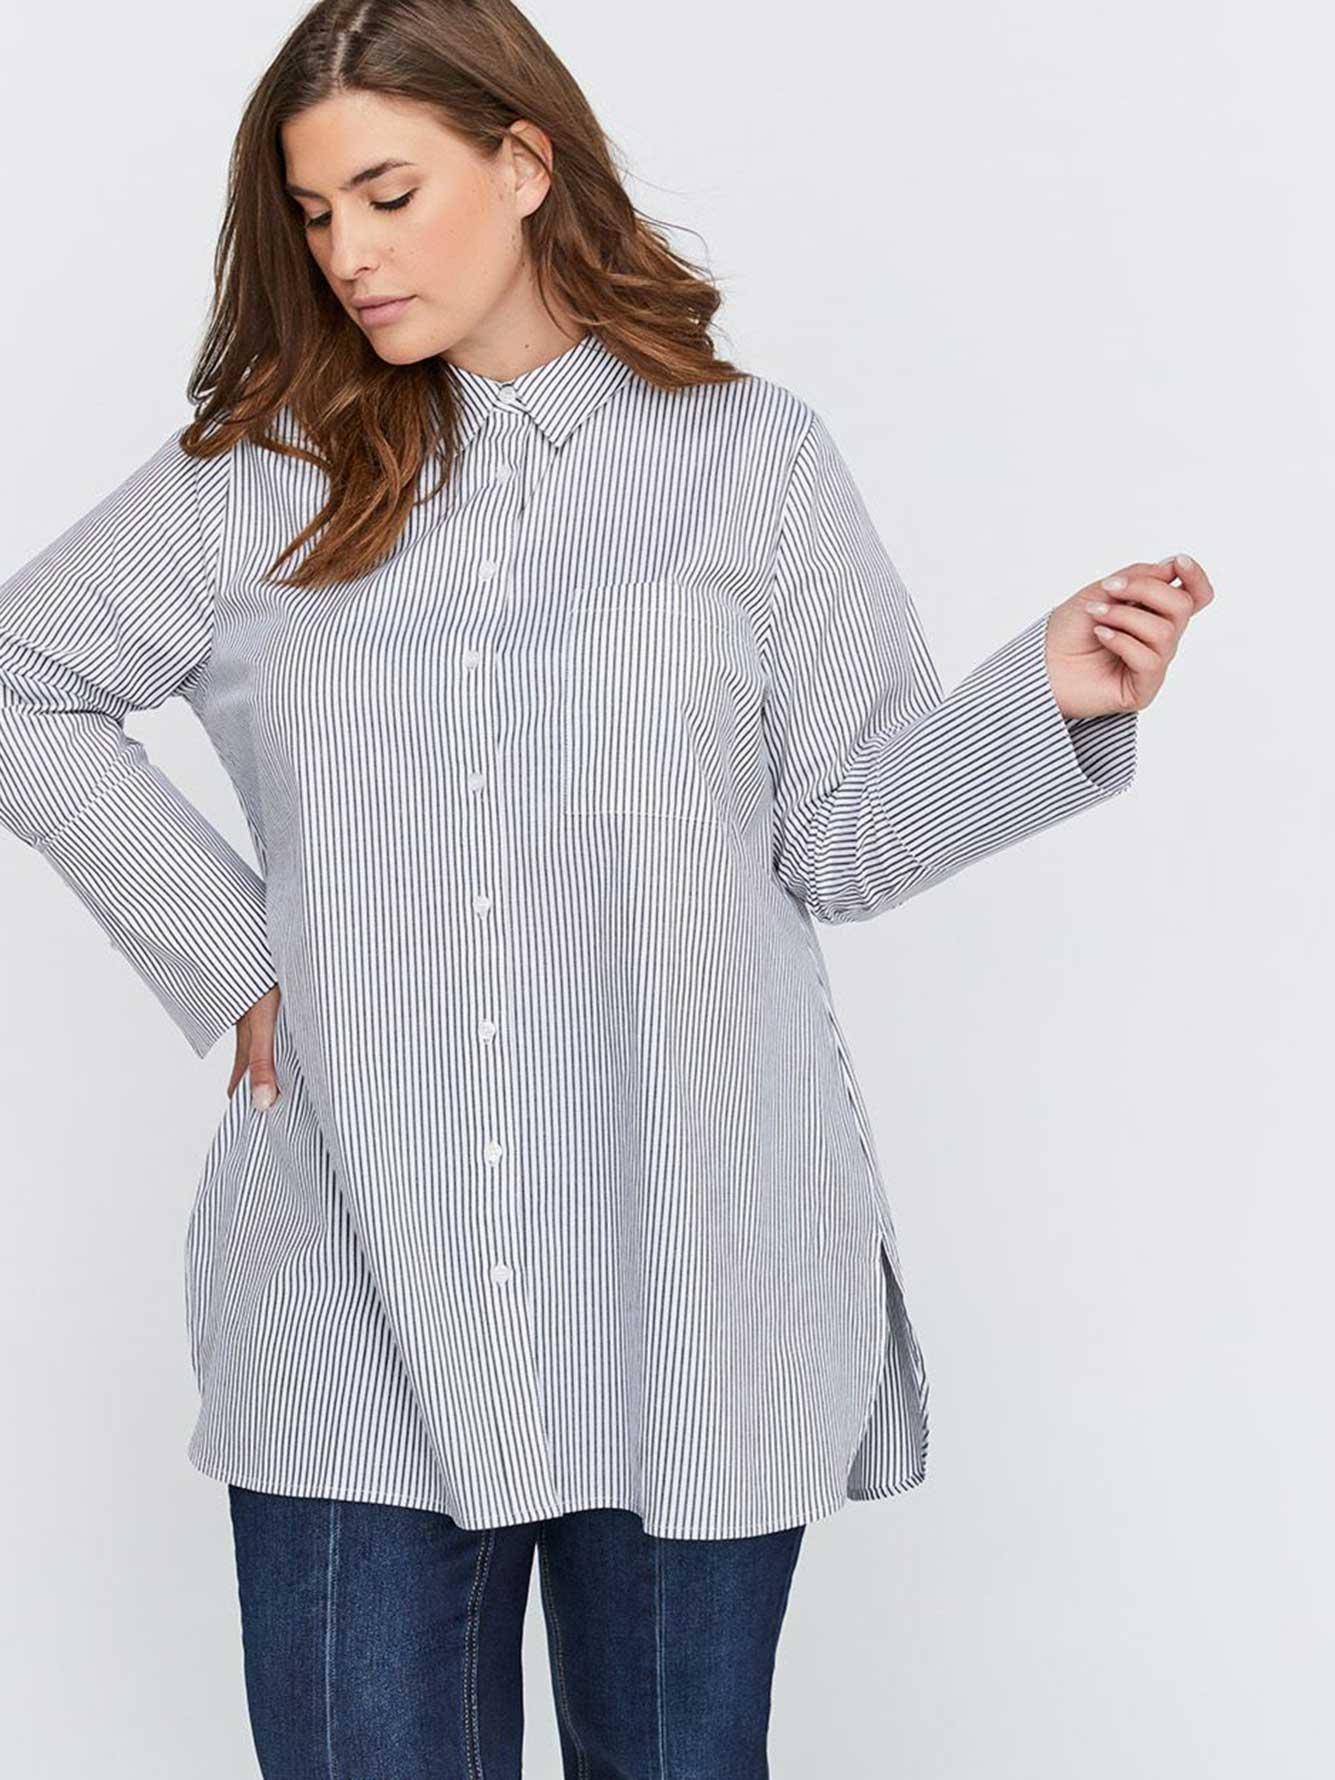 ad968ad3a60 Long Sleeve Striped Boyfriend Tunic Shirt with Pearl Cuff Detail - Michel  Studio